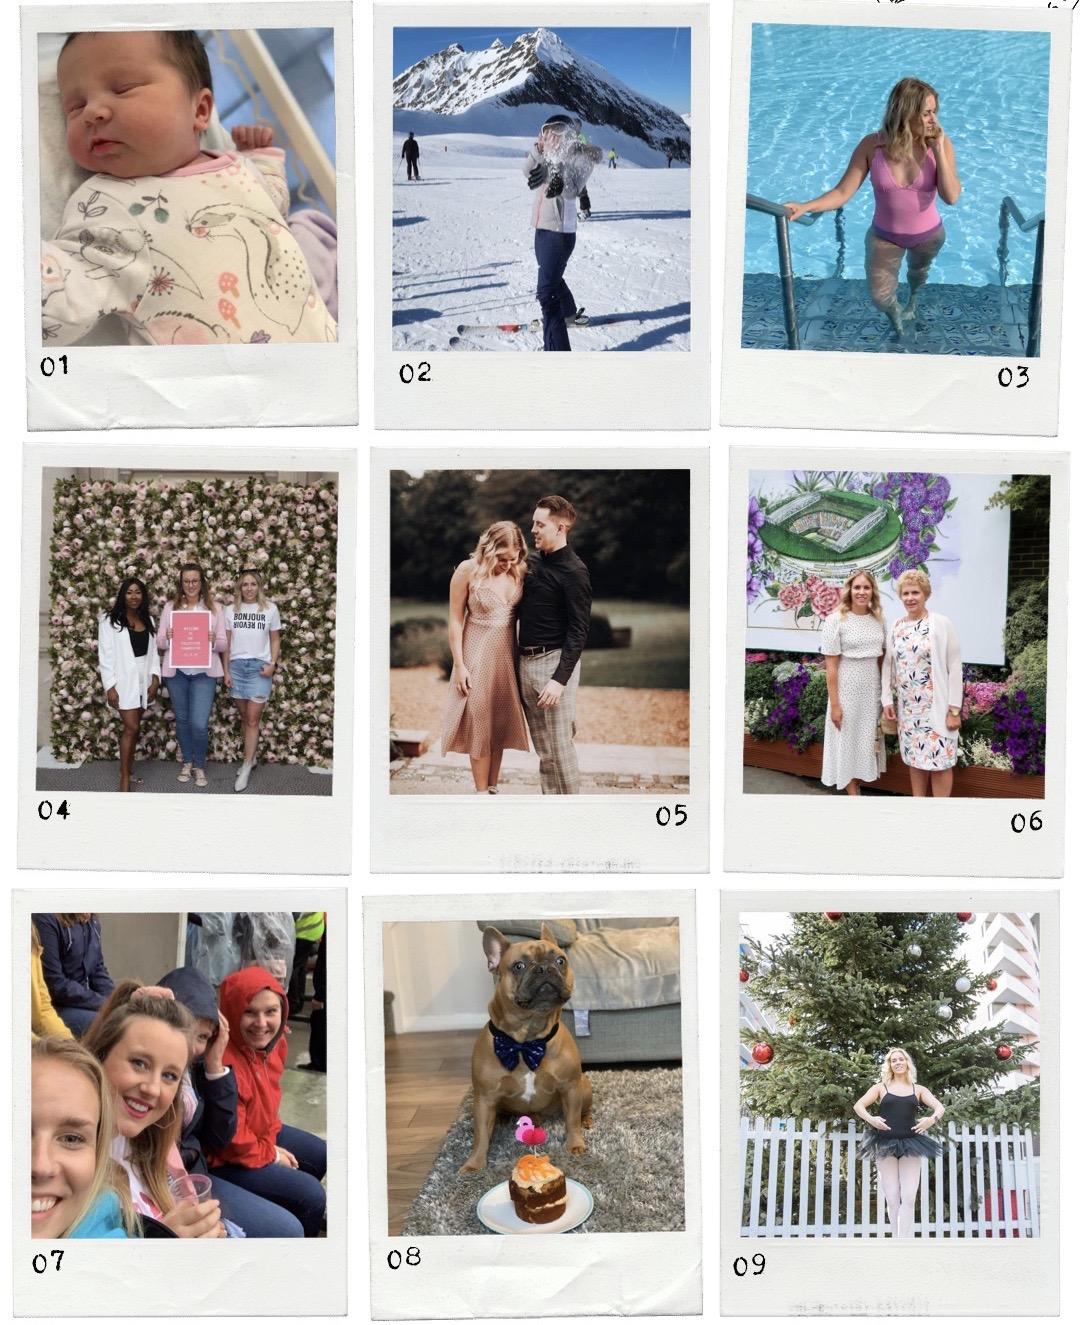 Rachel Emily's Top Nine Highlights of 2019 - Rachel Emily Blog